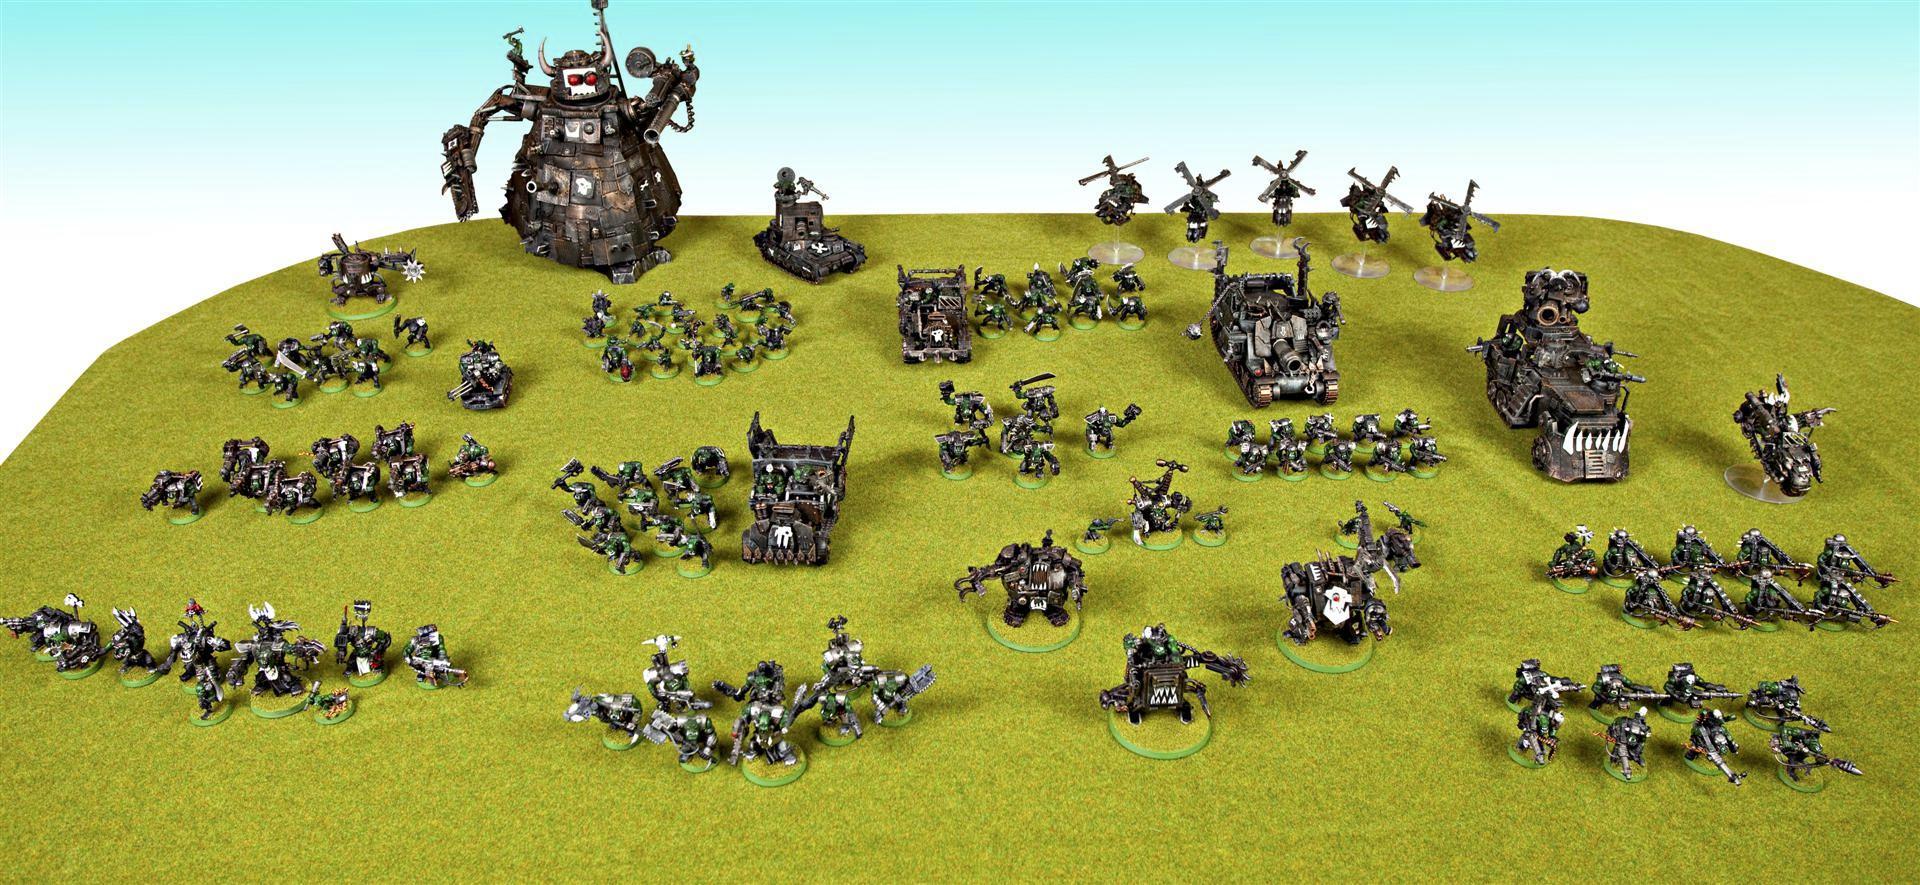 Army, Battlewagon, Big Mek, Burnas, Deff Dread, Killa Kan, Nob, Orks, Stompa, Trukk, Trukks, Warboss, Warhammer 40,000